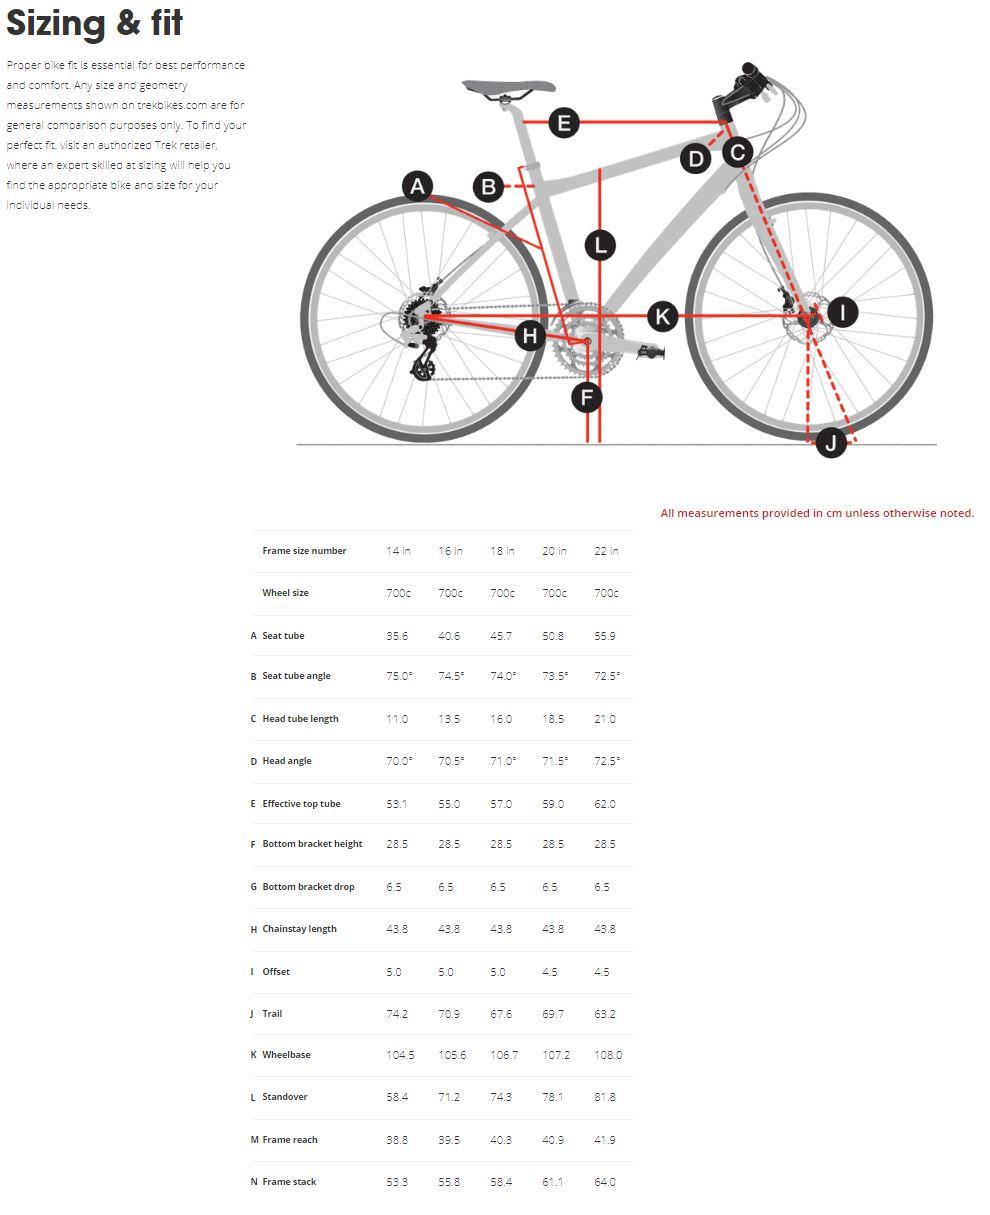 Trek FX S 6 geometry chart